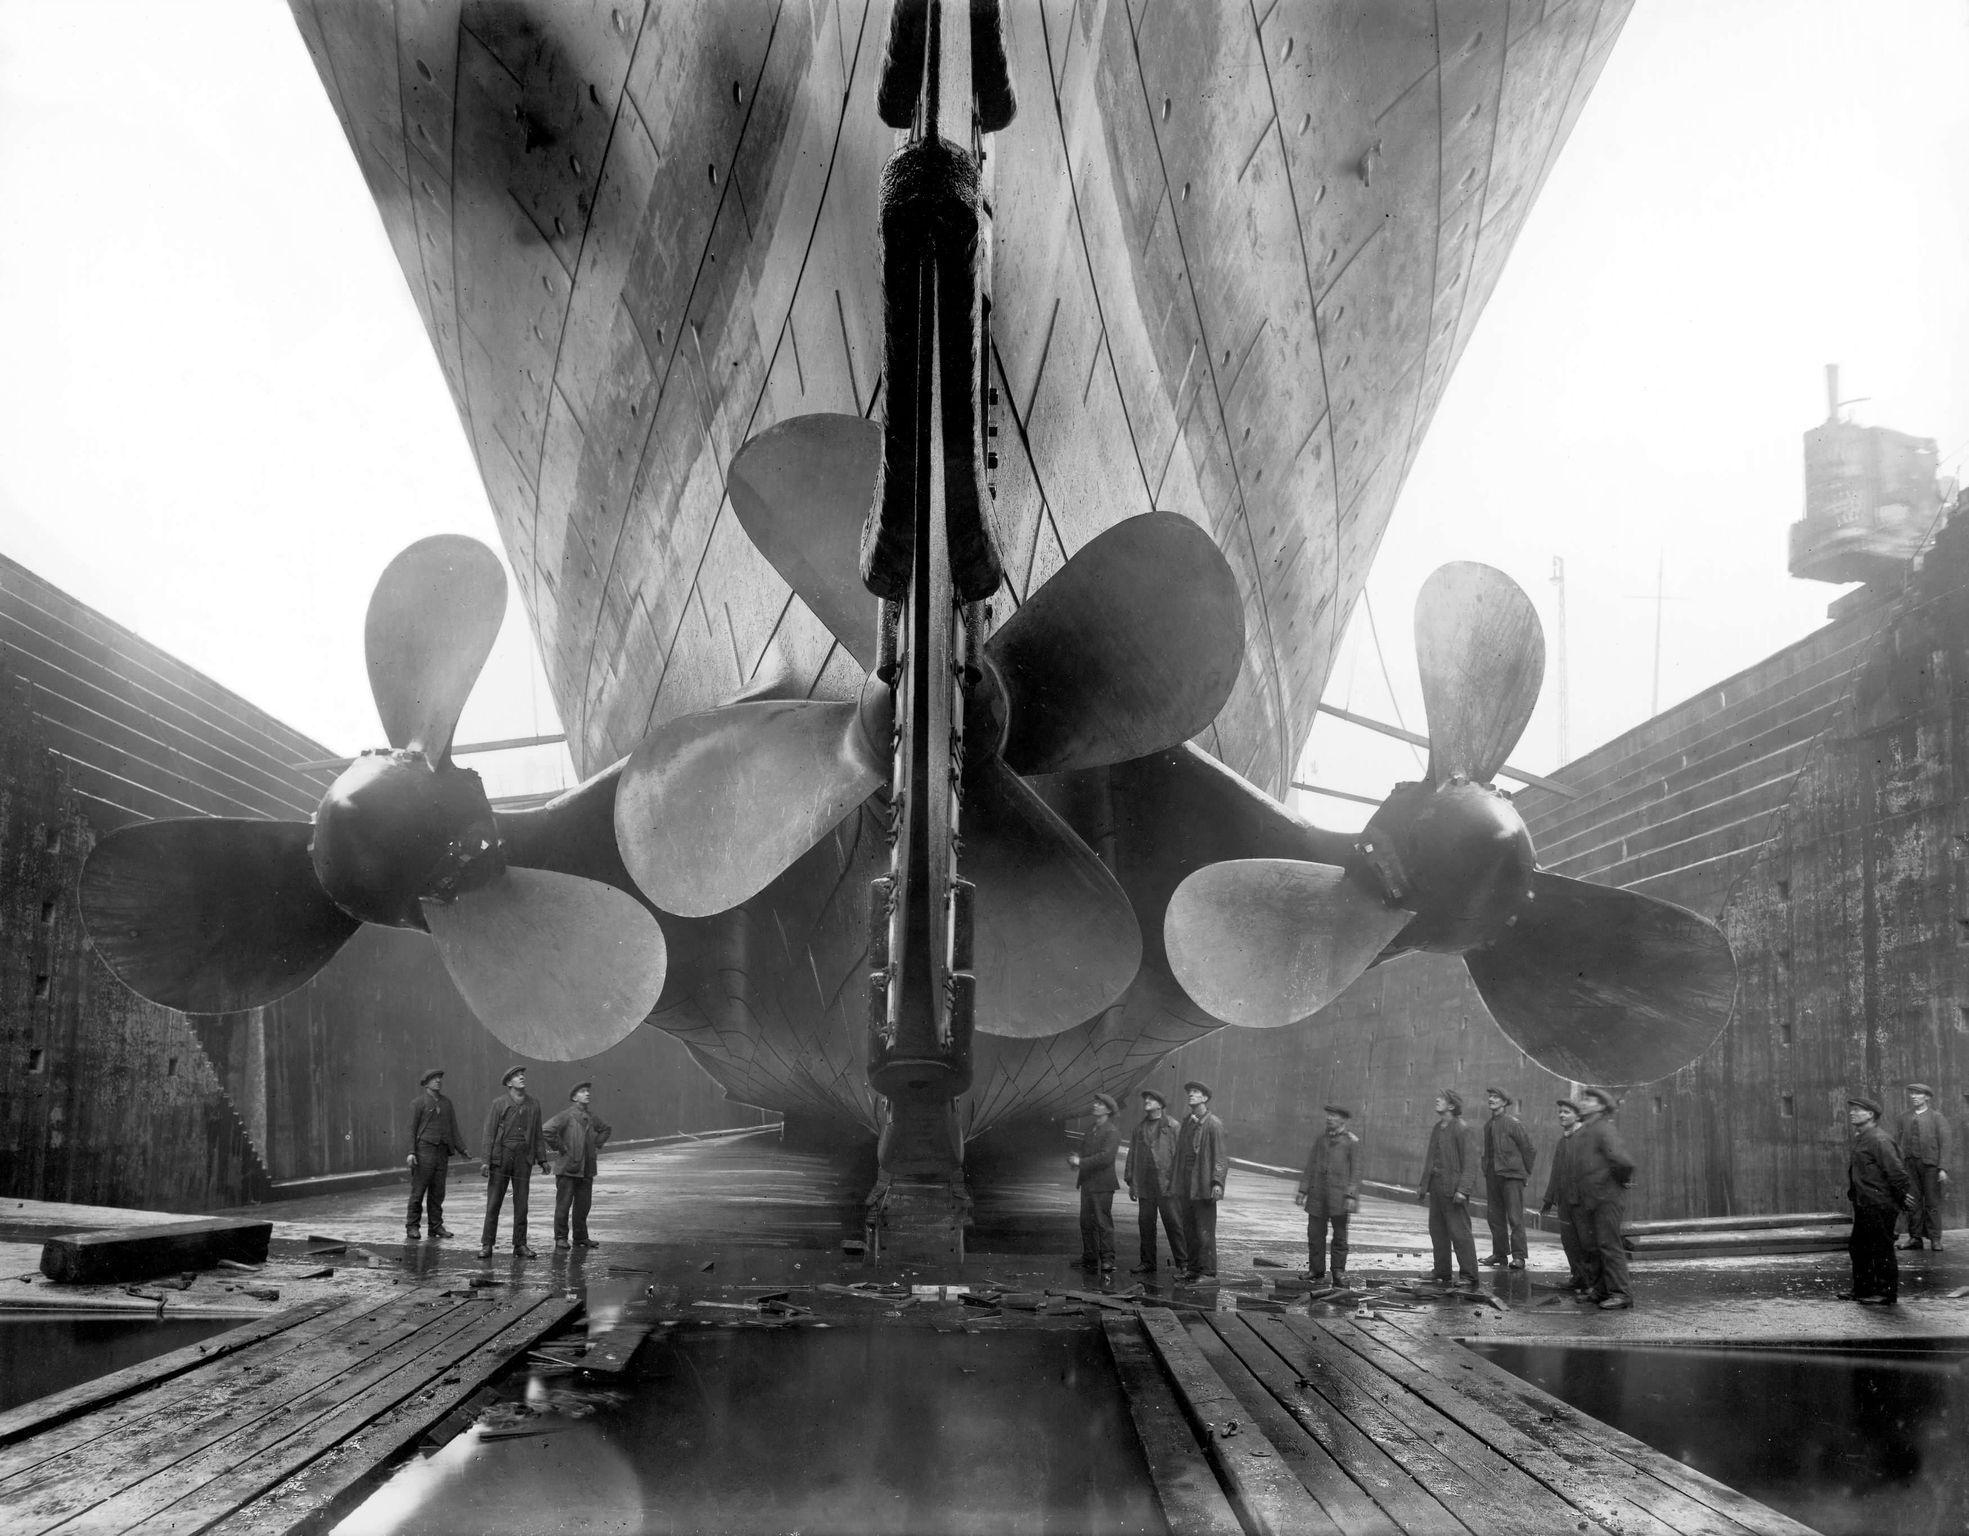 Титаник в сухом доке Harland & Wolff Shipyard. Источник: ru.wikipedia.org